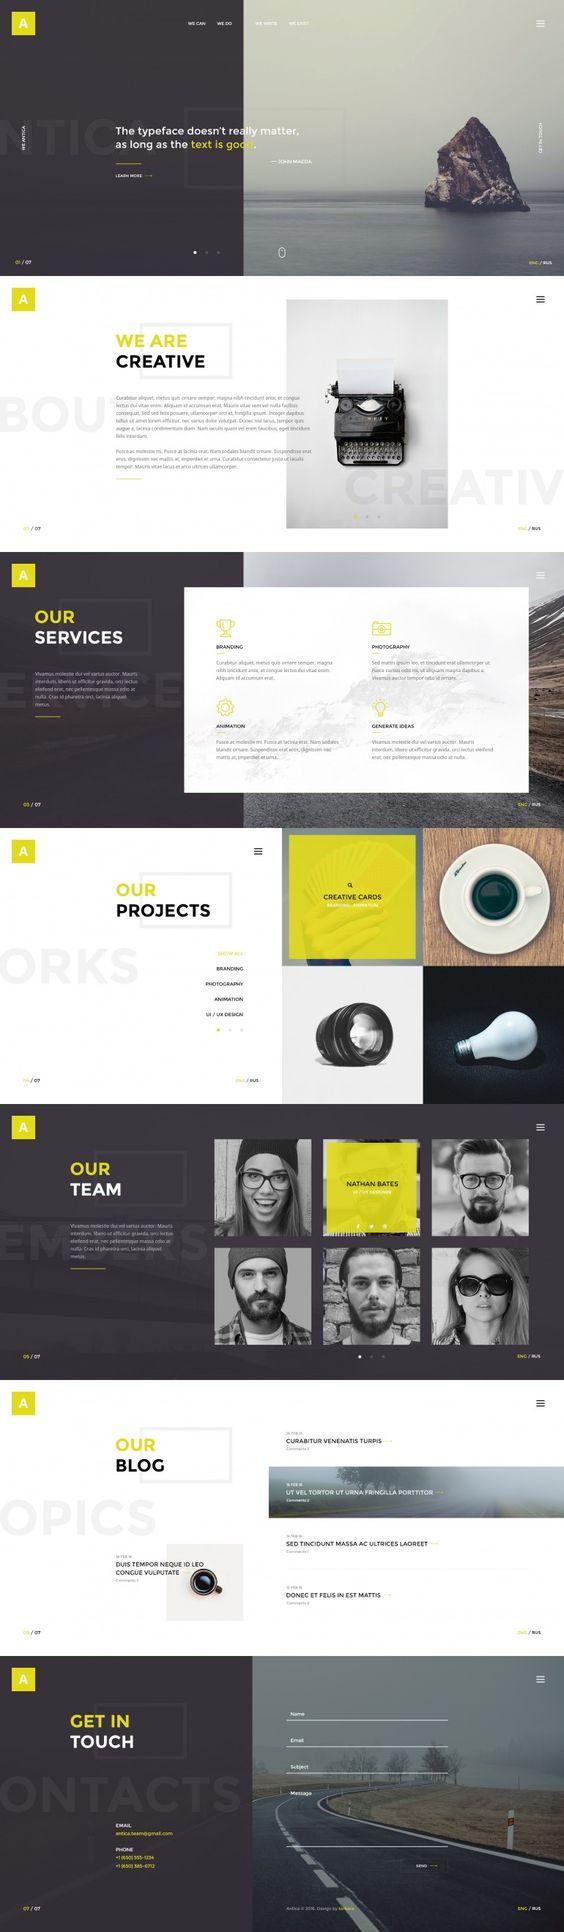 Antica — Multipurpose Business Agency/Personal Portfolio // #WebDesign #GraphicDesign #Inspiration